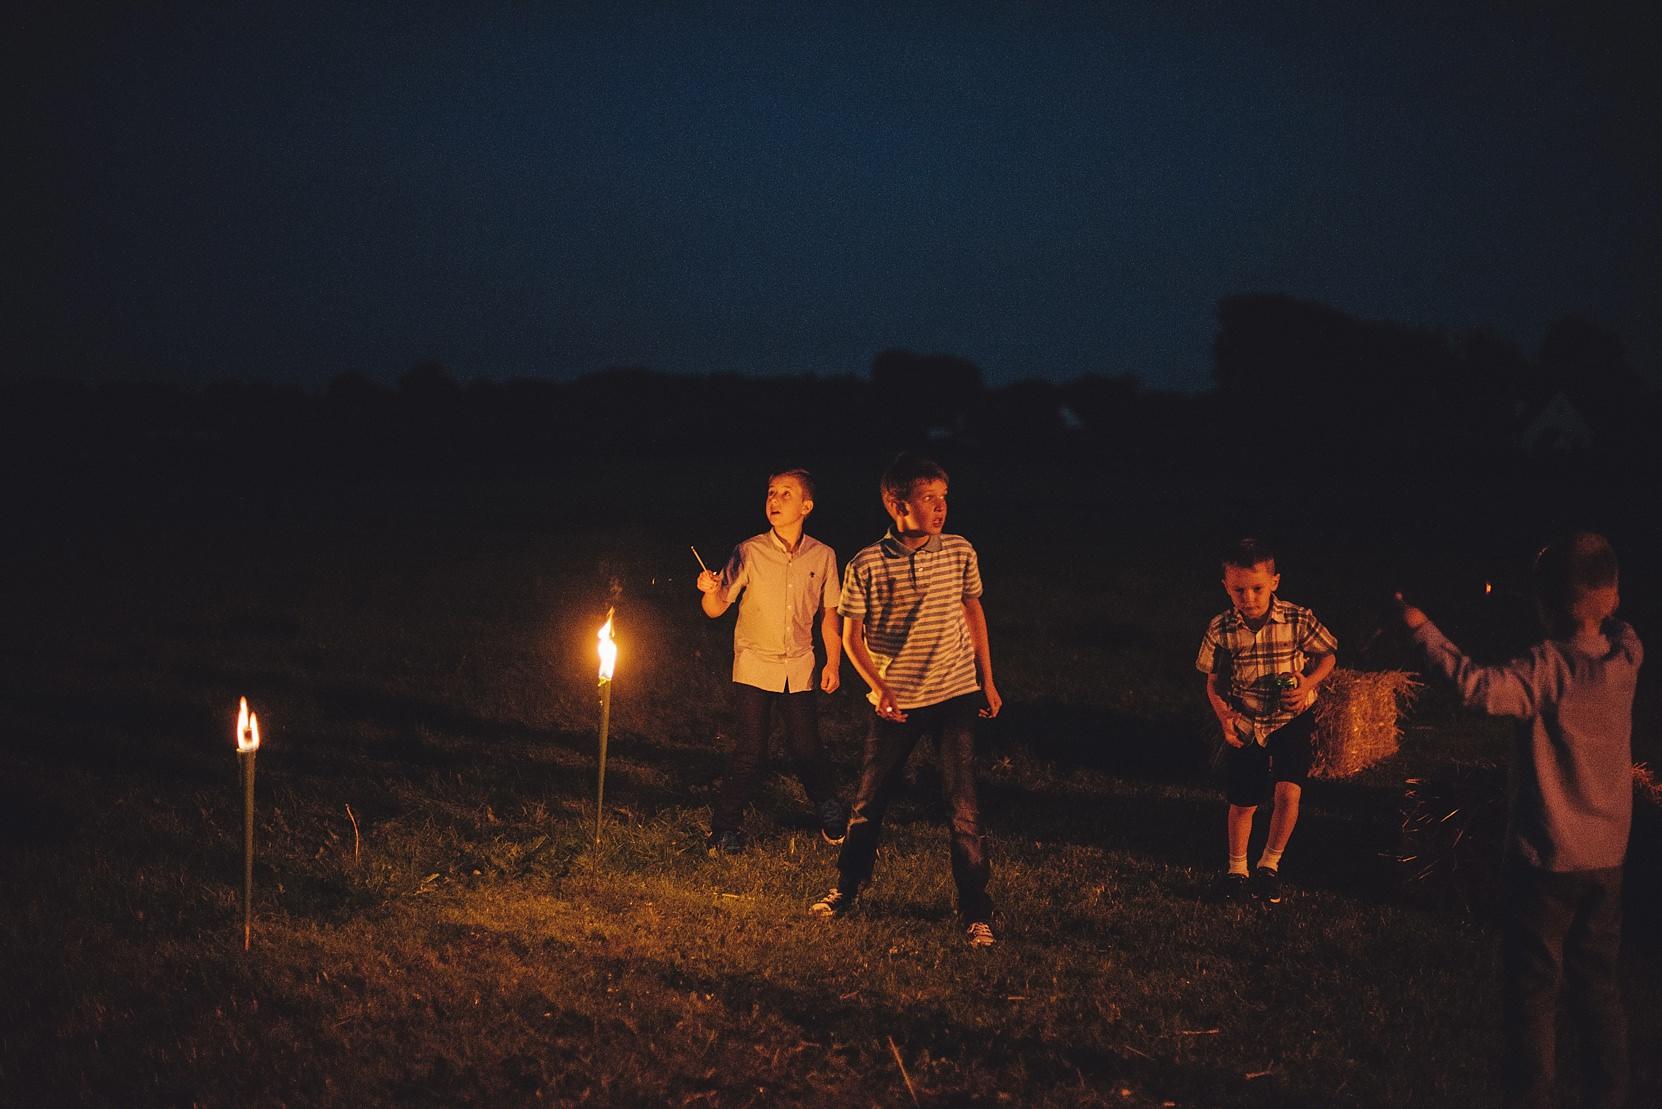 Kids at a wedding at night outside